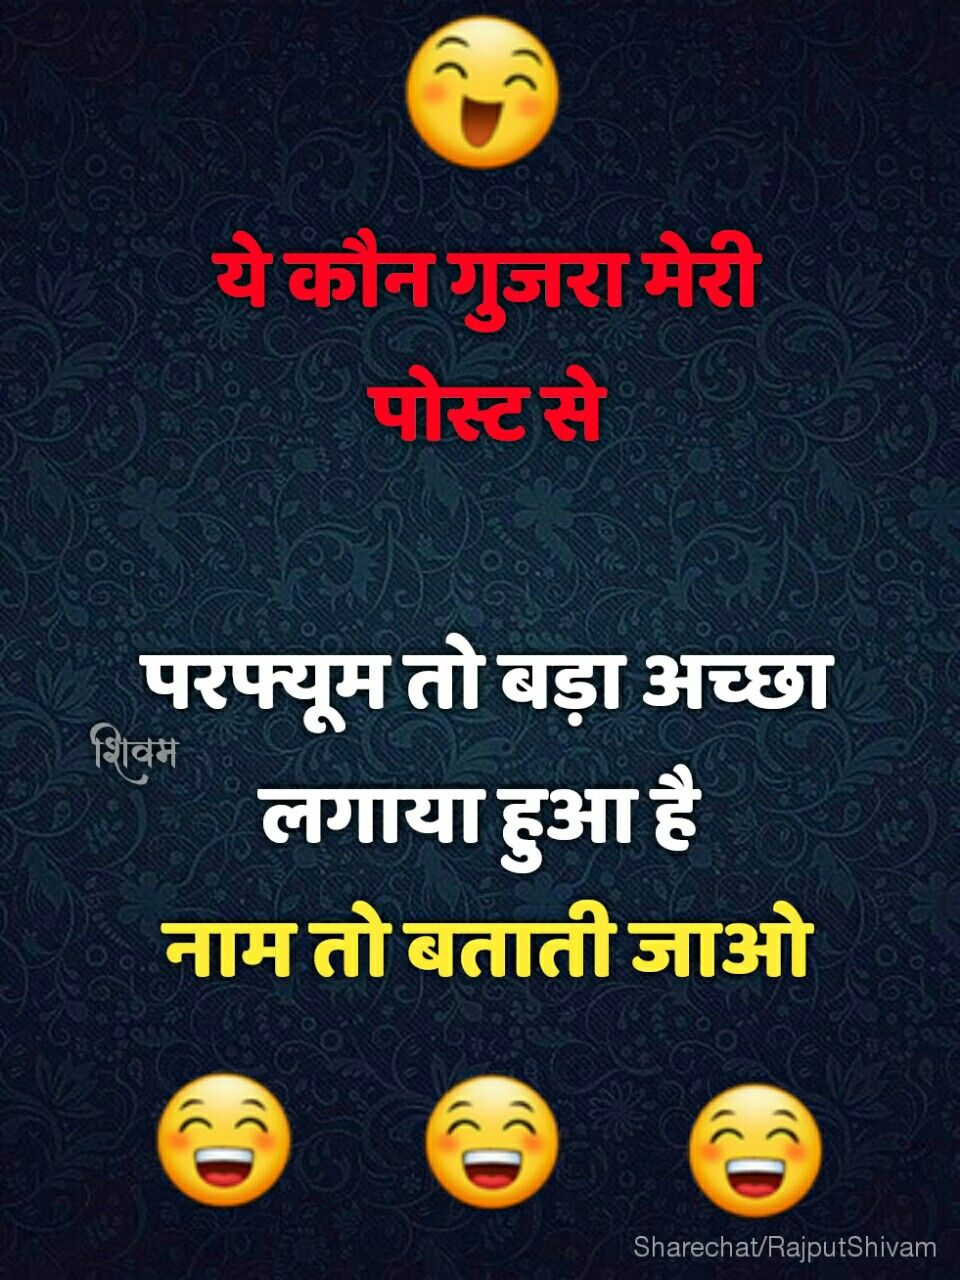 Follow Me For More Harshvardhan Sen Some Funny Jokes Fun Quotes Funny Crazy Jokes